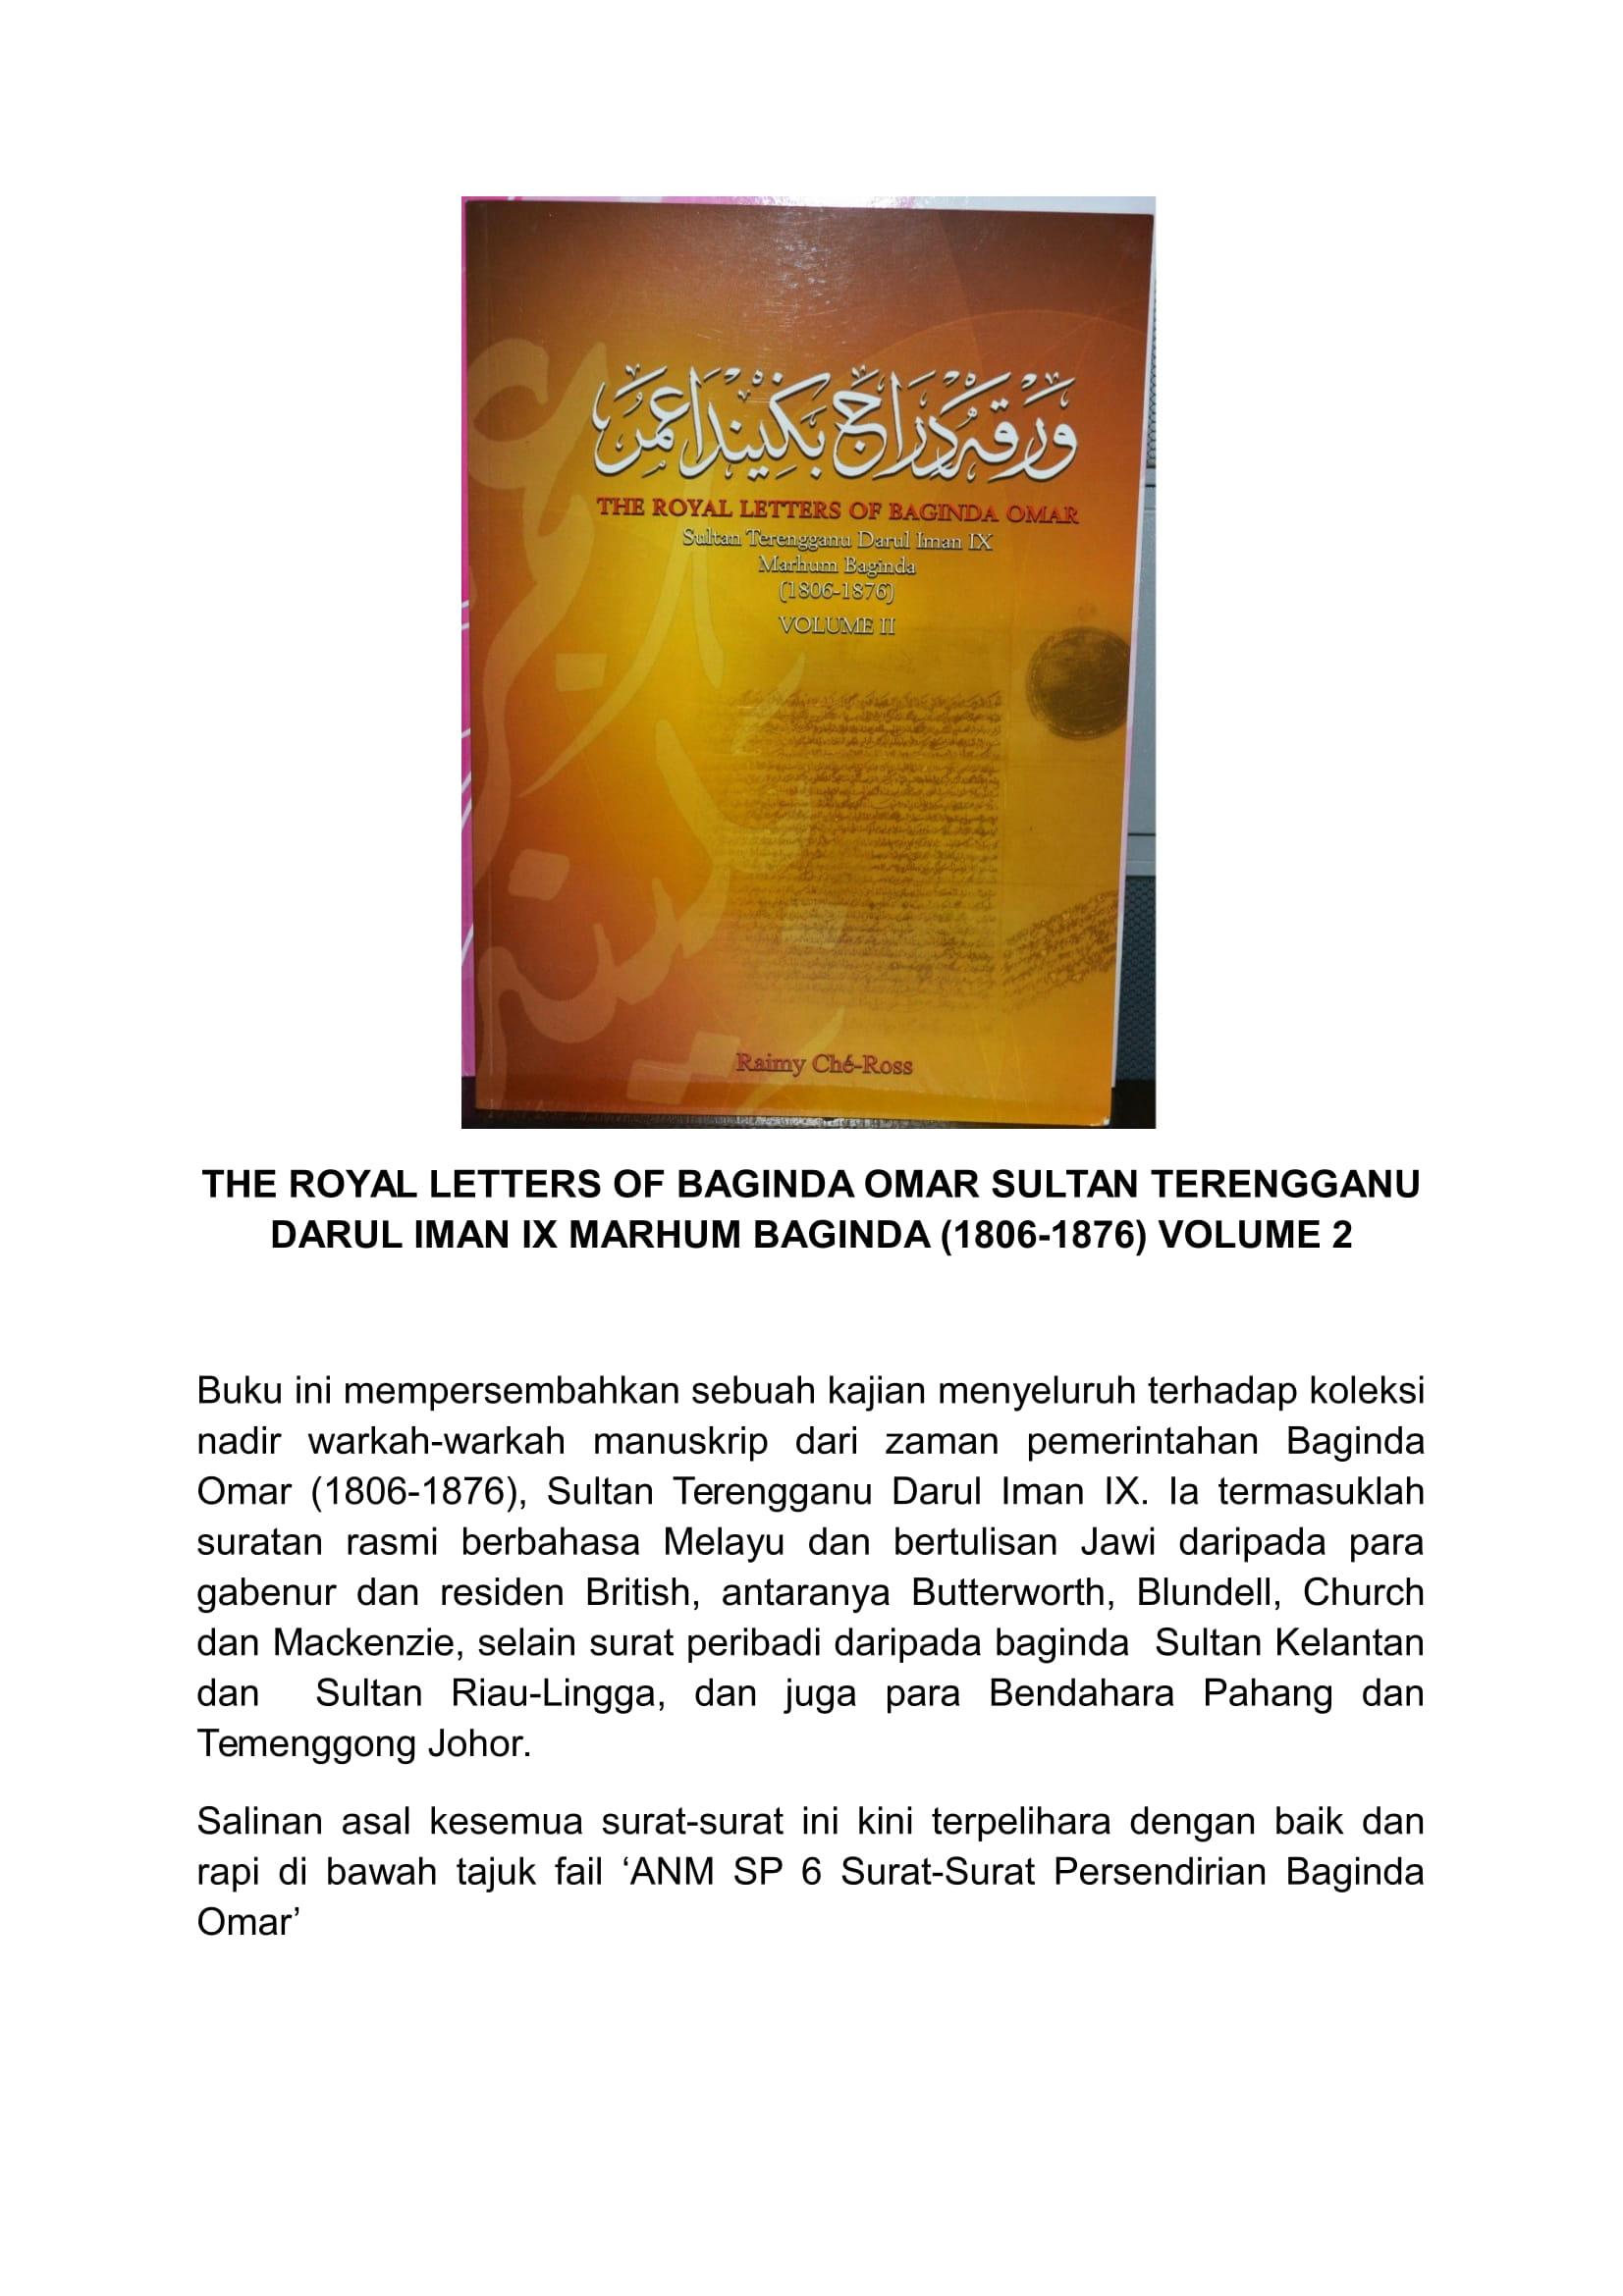 THE ROYAL LETTERS OF BAGINDA OMAR 1806-1876 Vol 2 (Kulit Tebal- RM220) (Kulit Nipis - RM160.00)